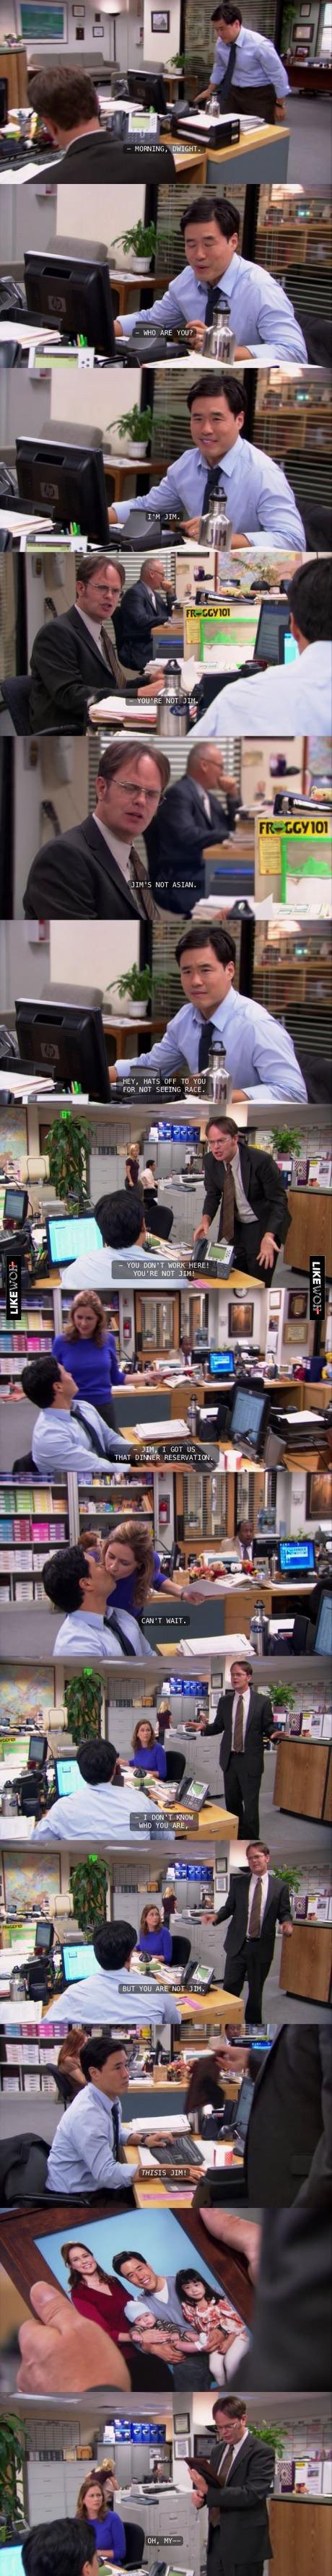 Jim. source: The Office. ree. tiill' q HEY, rais -EFF ili FOR NOT SCEEN I ilgili' it If TOO tatl' T Hanna Hm? , 5